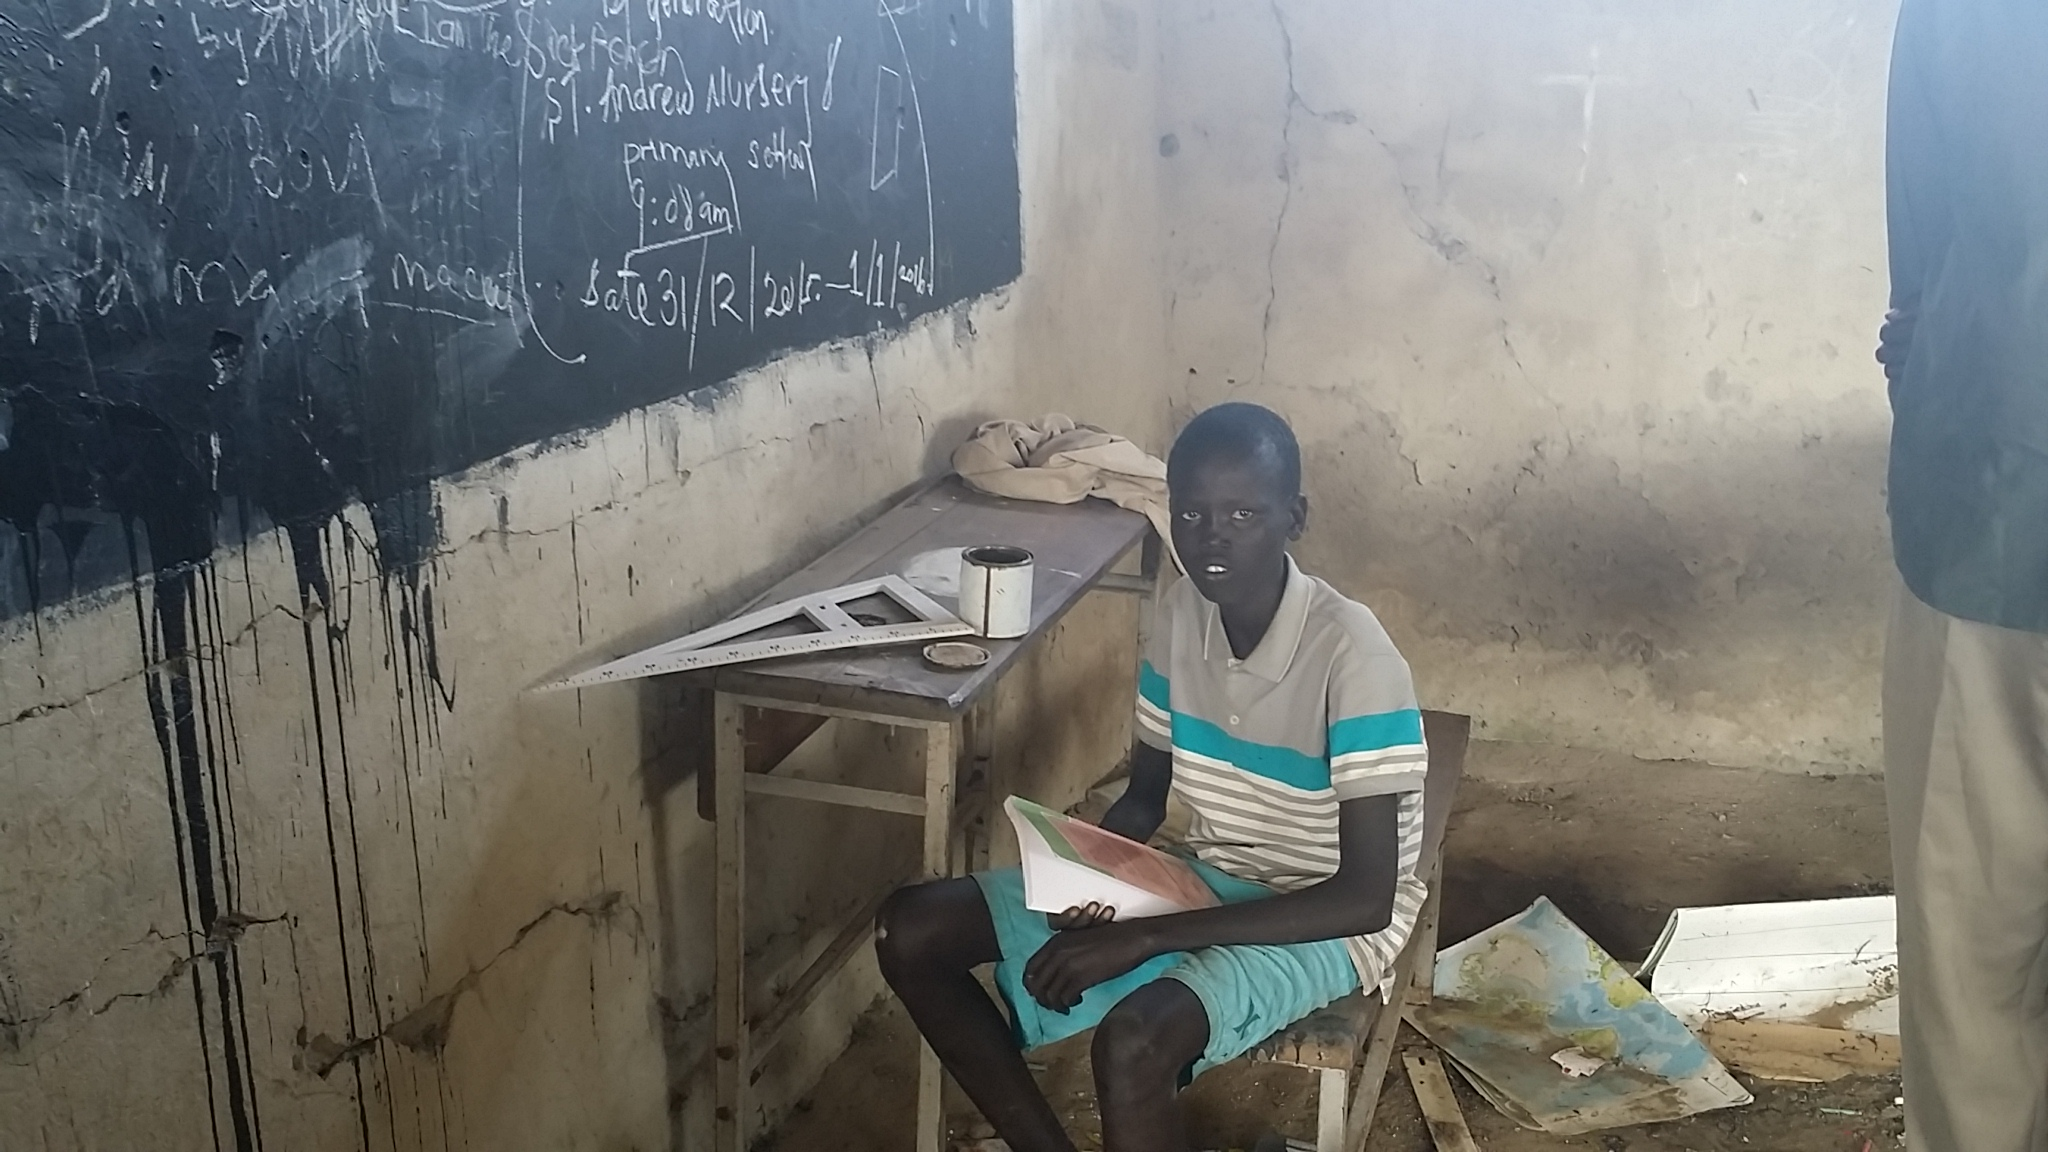 South Sudan: on the edge of failed statehood